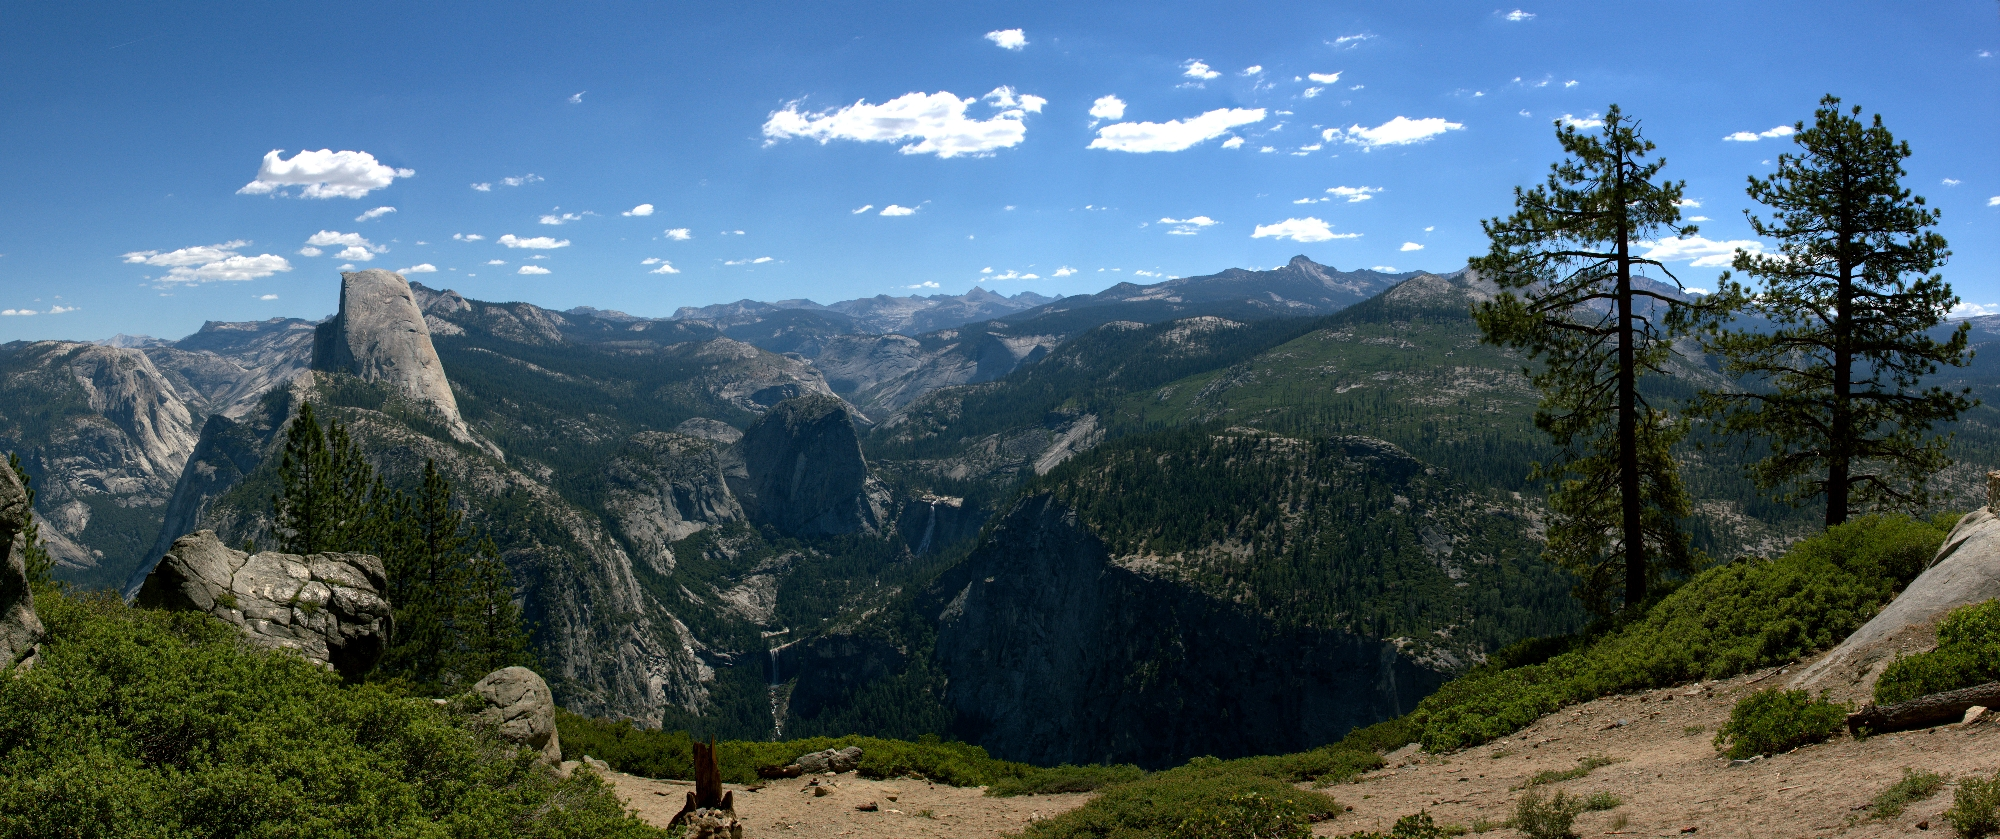 Yosemite_Half-Dome_Ultrawide1.jpg